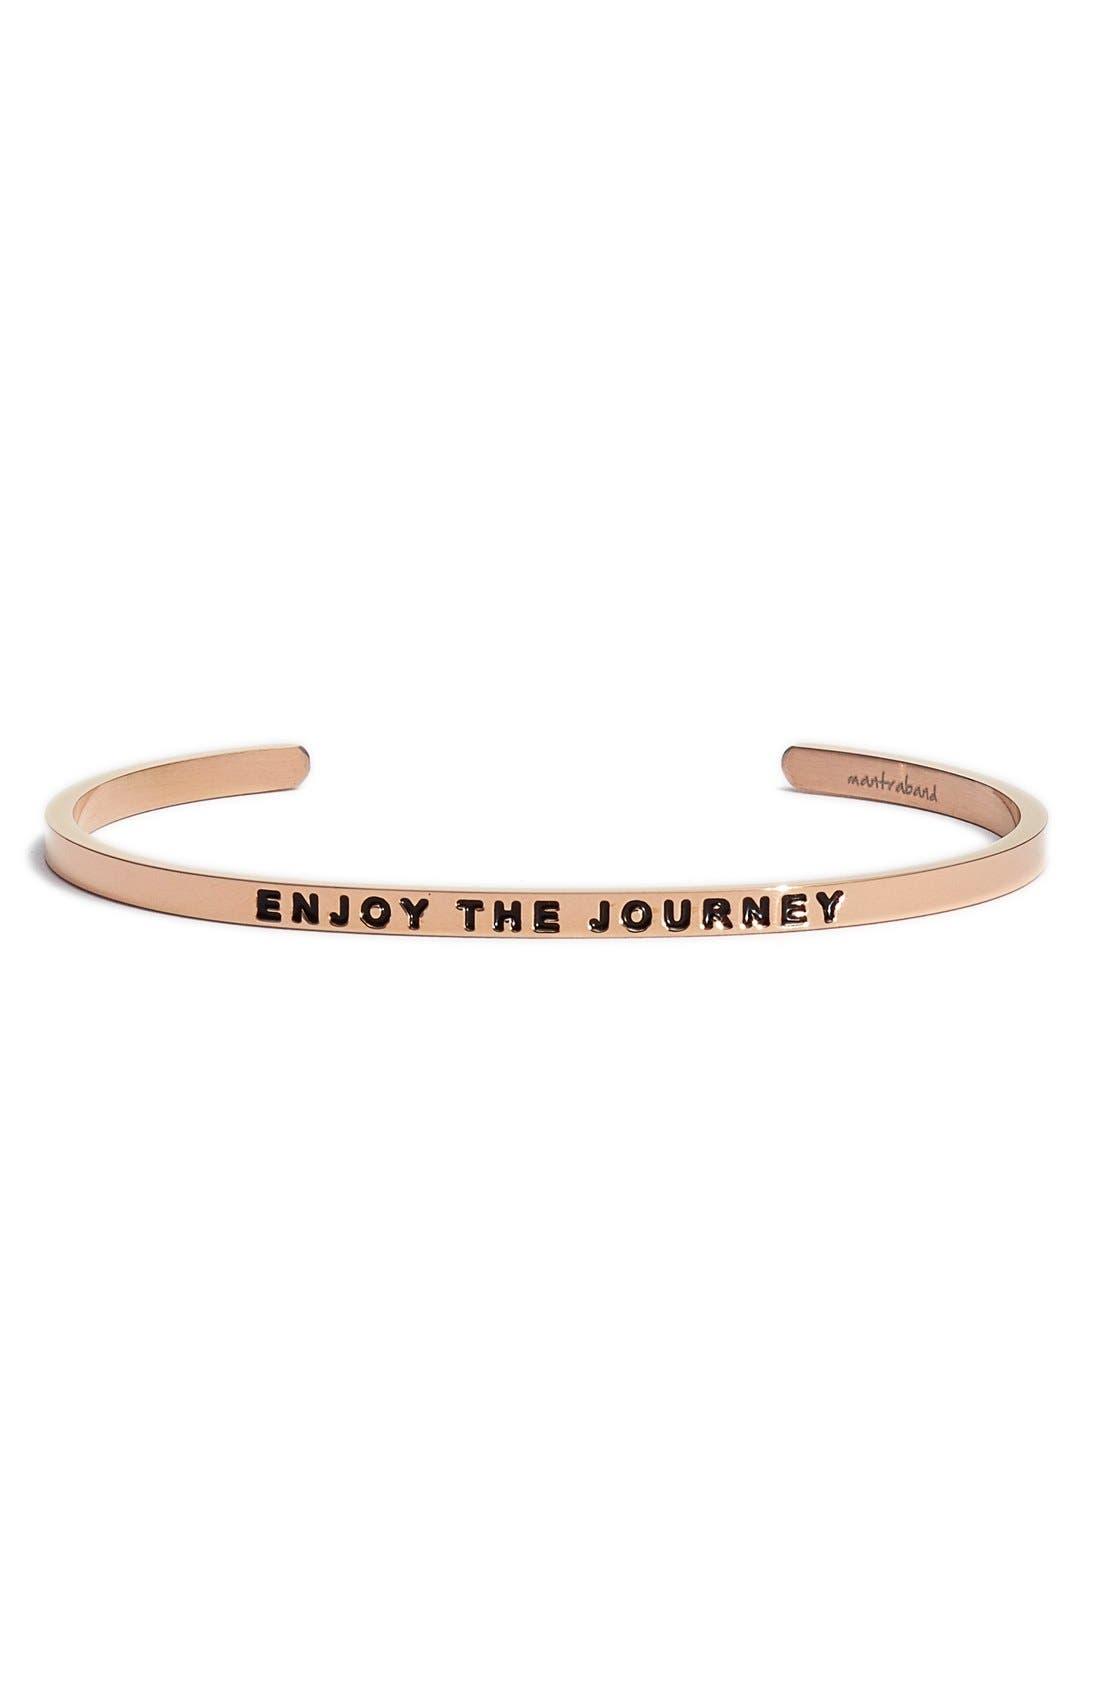 Alternate Image 1 Selected - MantraBand® 'Enjoy the Journey' Cuff